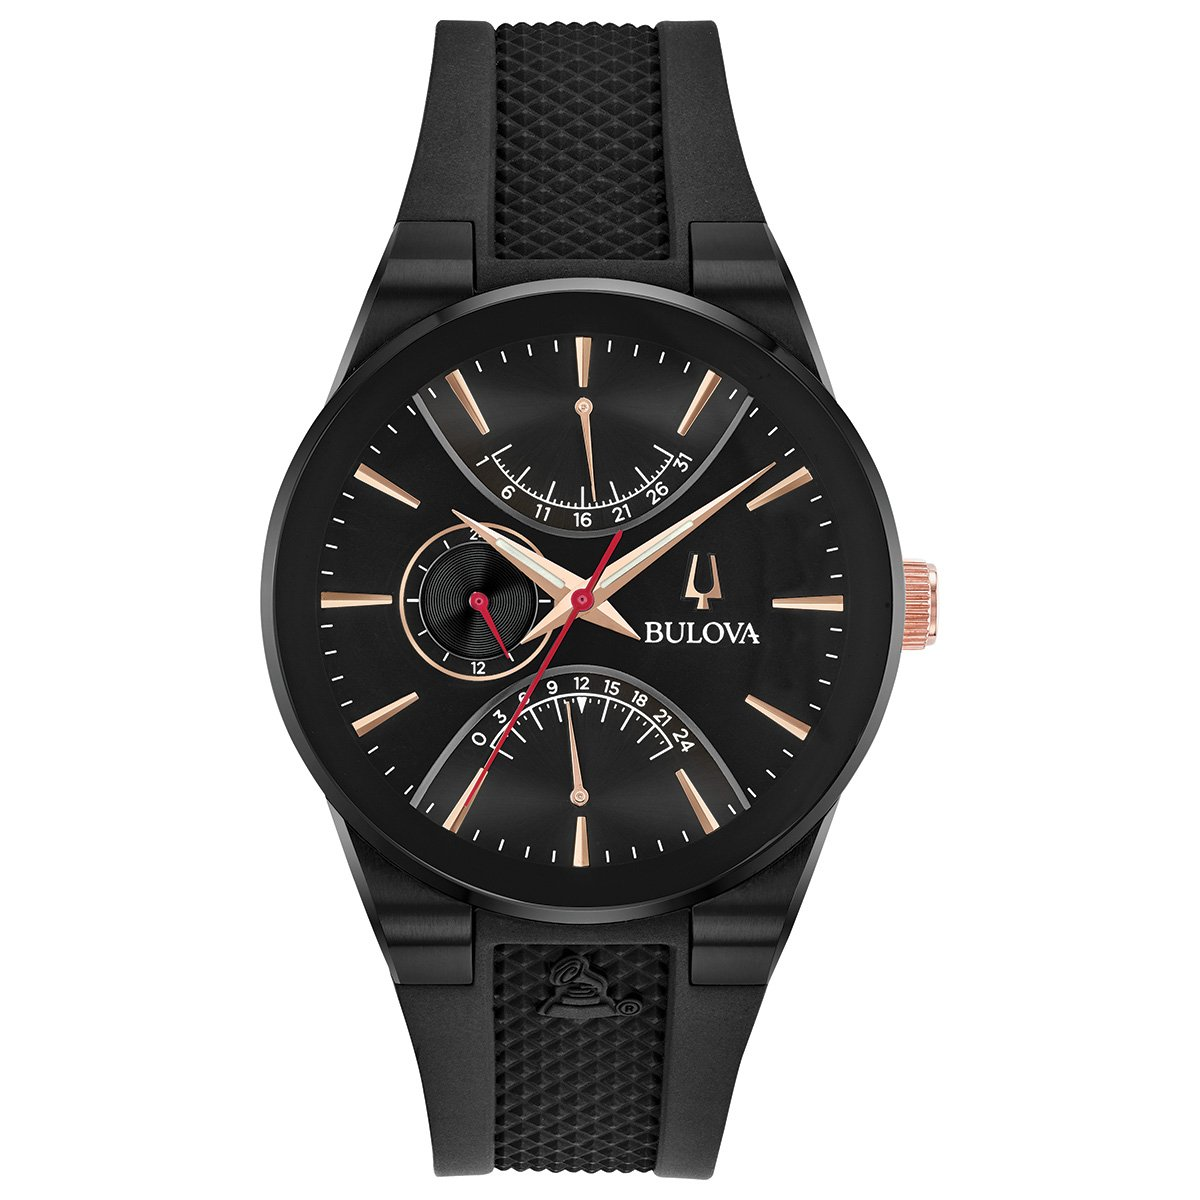 Reloj para Caballero Bulova Color Negro